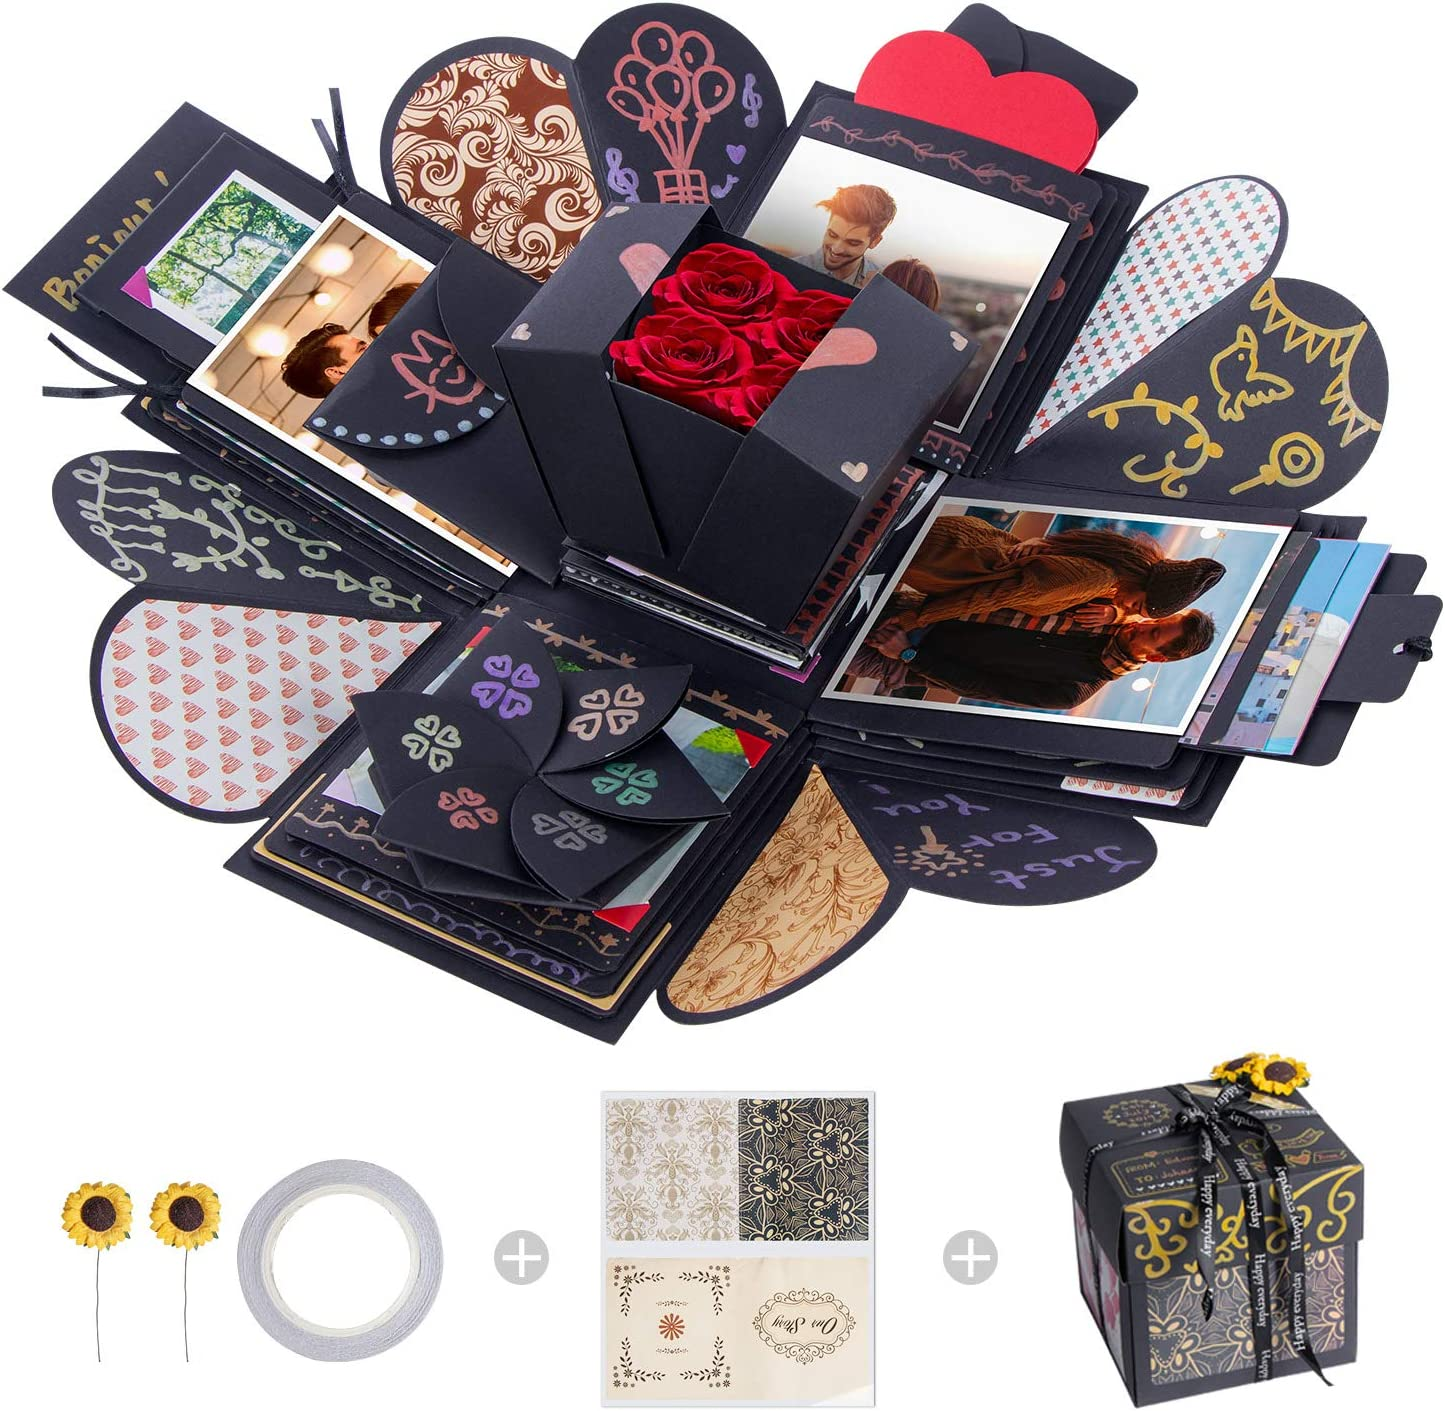 Momsiv Creative Explosion Box Love Memory Diy Photo Album Surprise Box Handmade Exploding Picture Box As Birthday Anniversary Wedding Christmas Gift Black